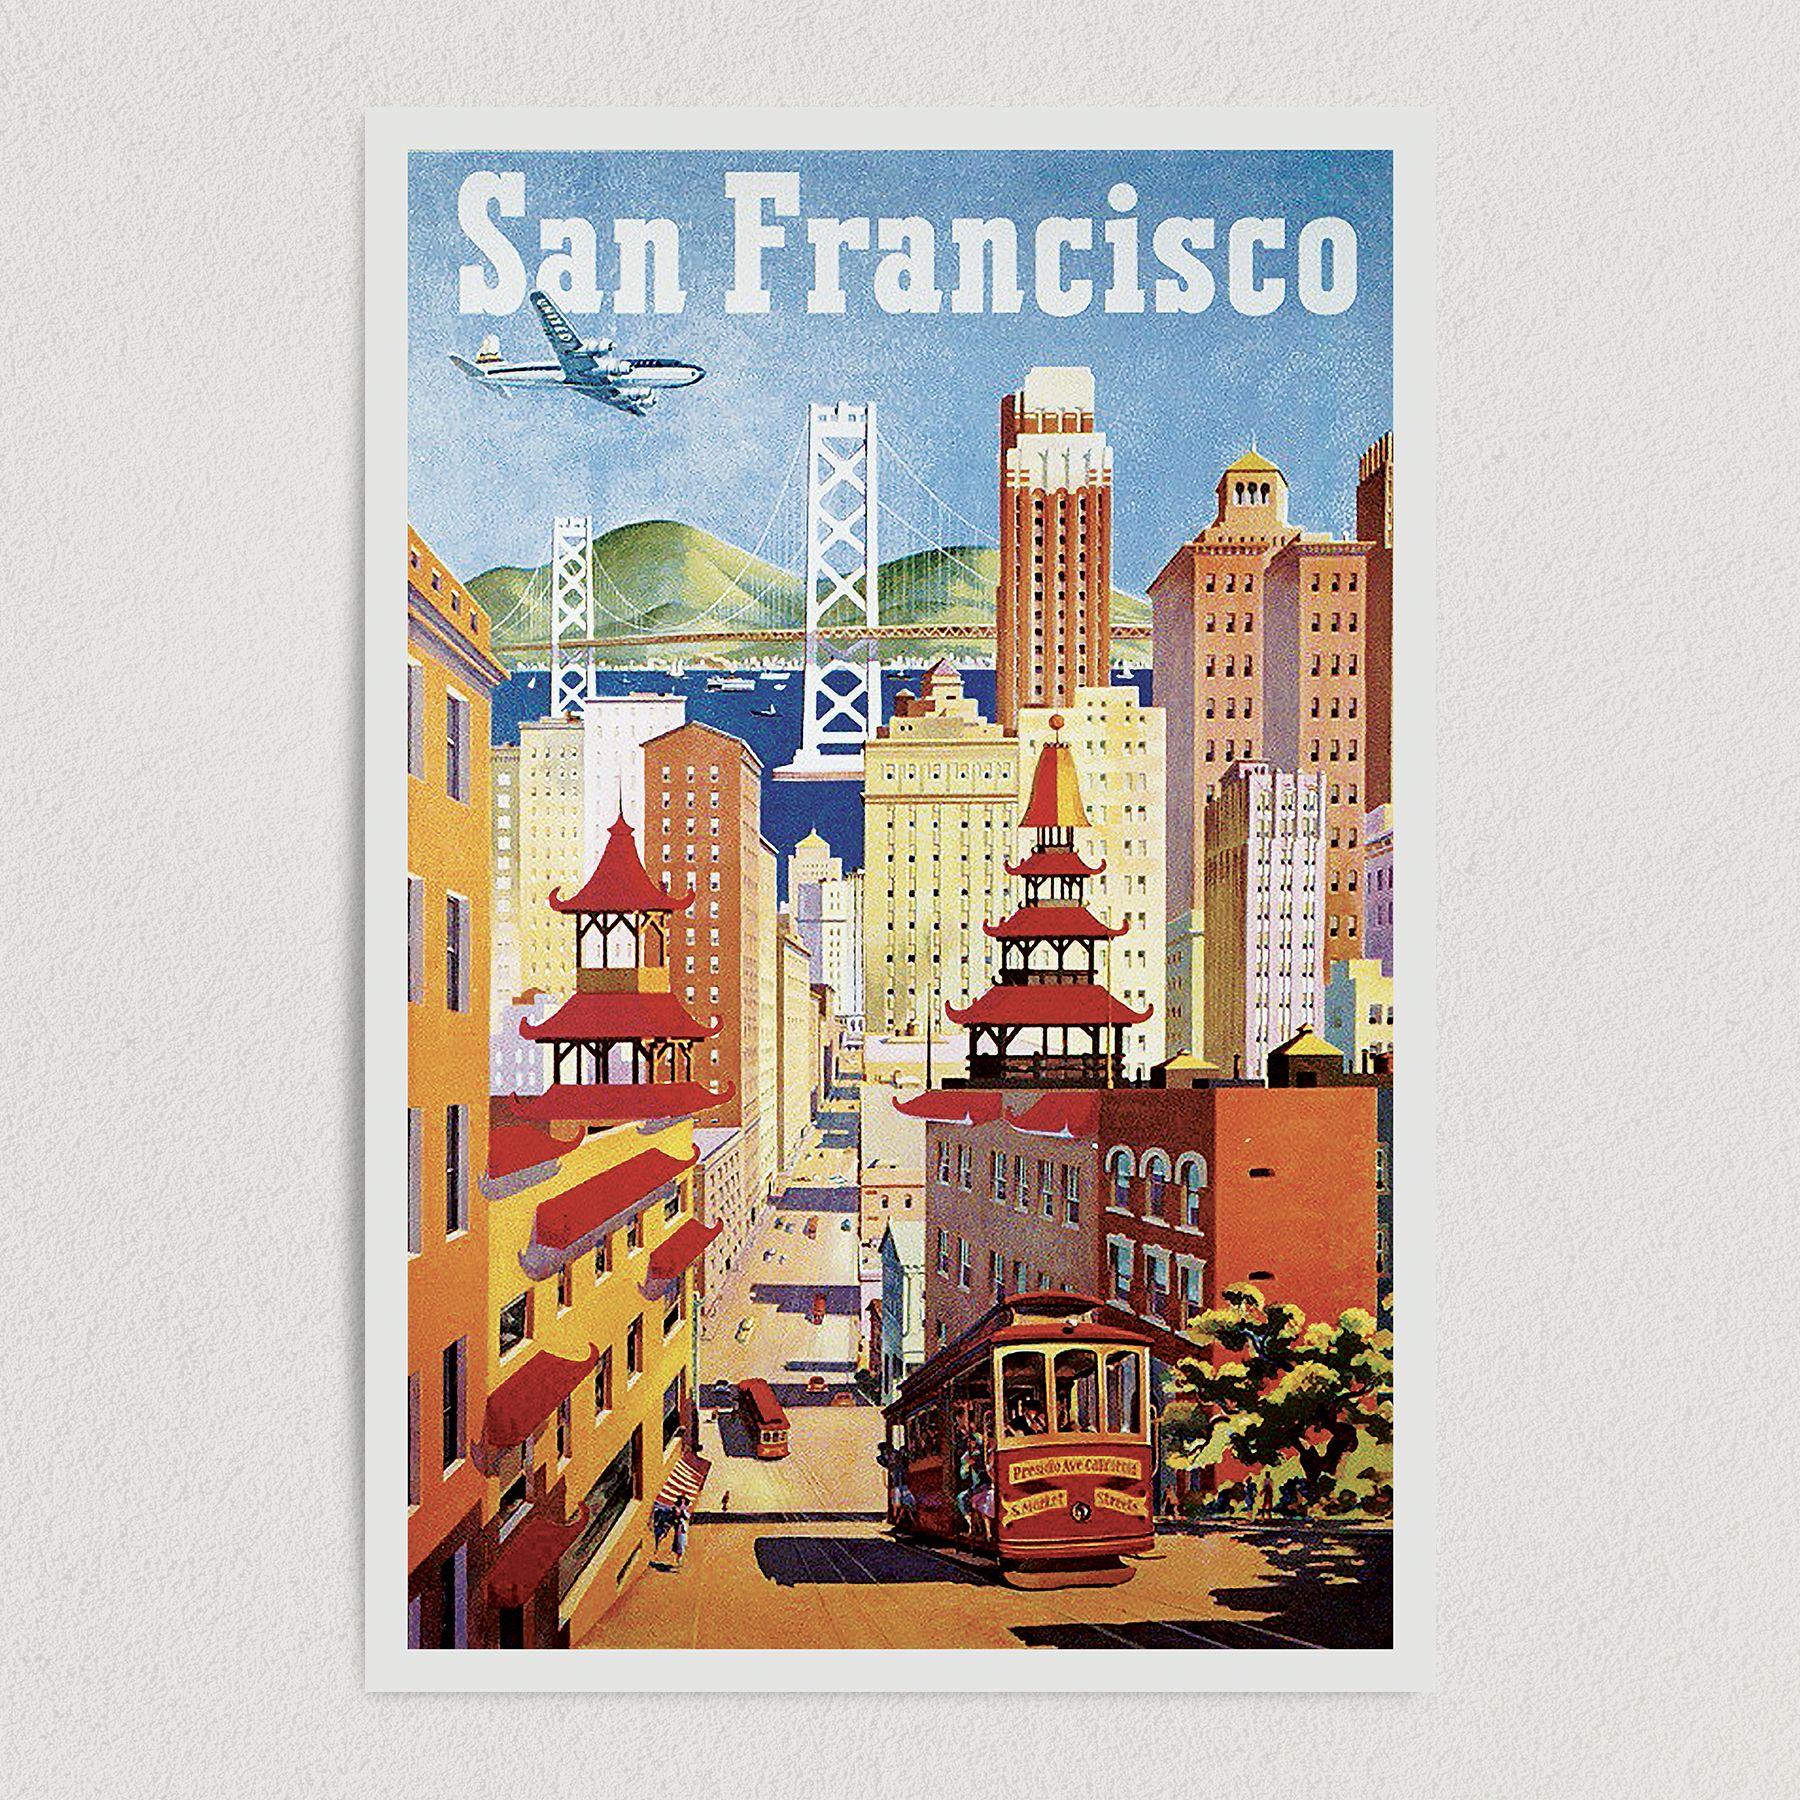 San Francisco Vintage Travel Illustration Art Print Poster 12″ x 18″ Wall Art T2133